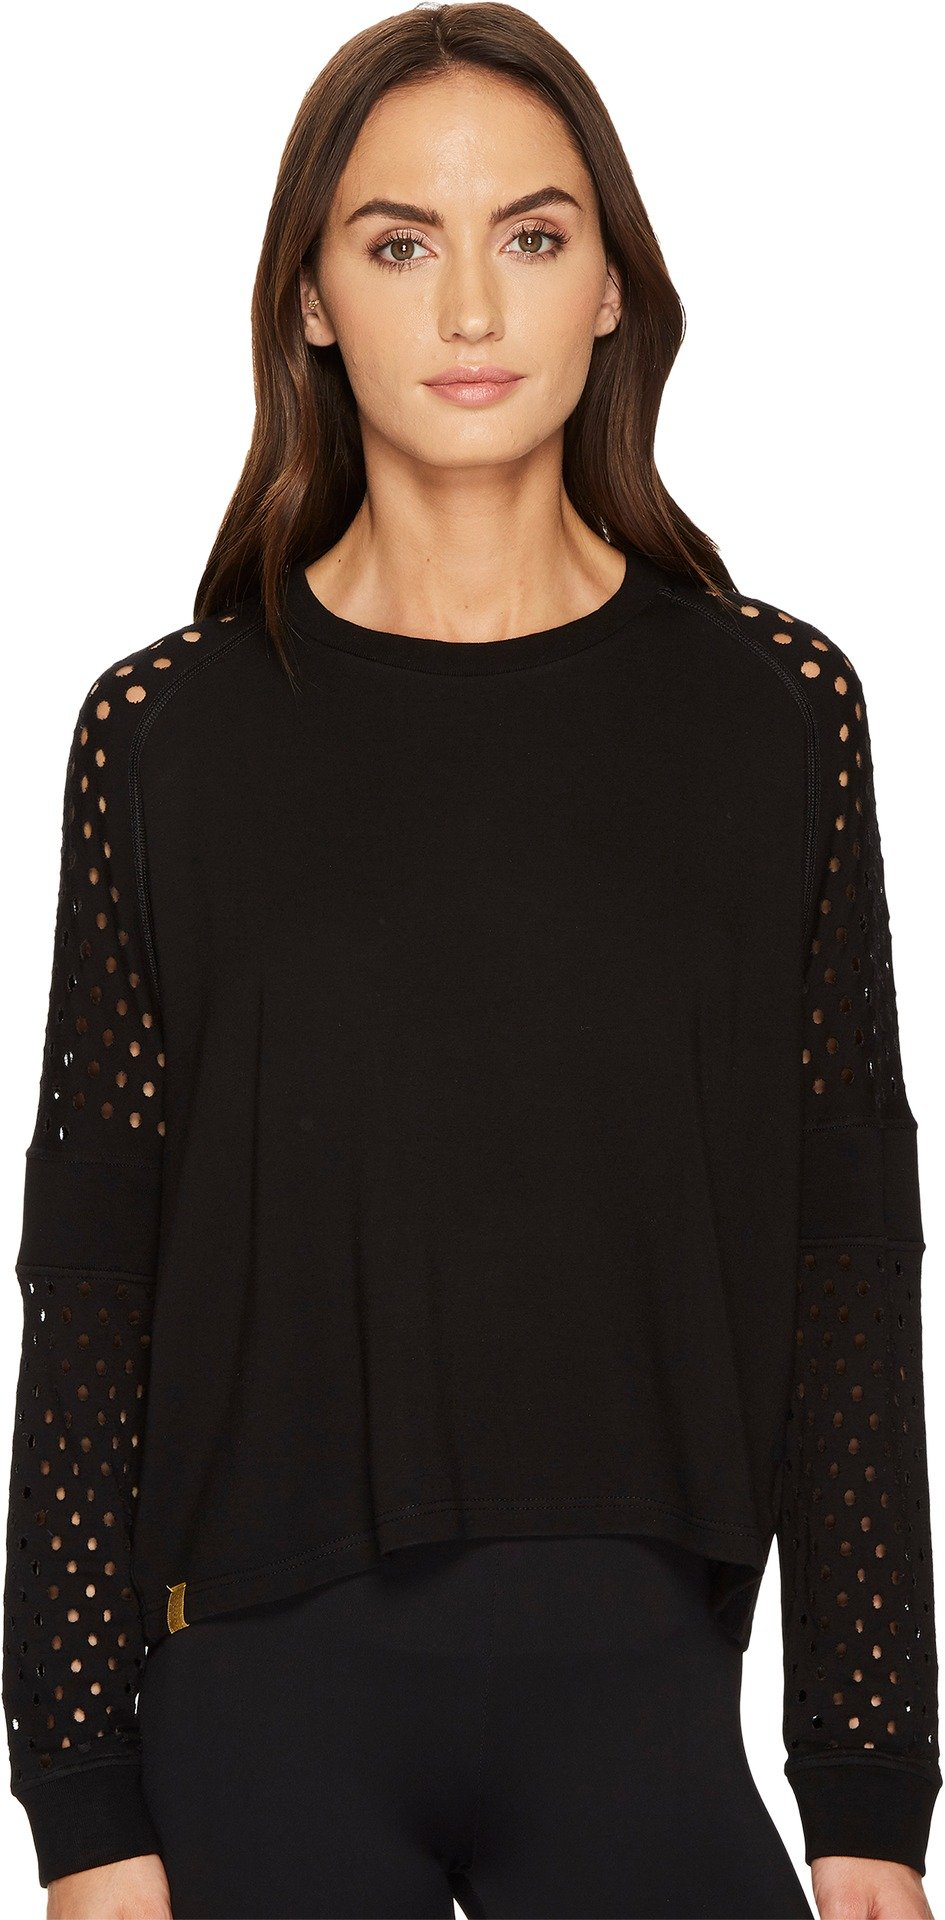 Monreal London Women's Flex Sweatshirt Black Sweatshirt